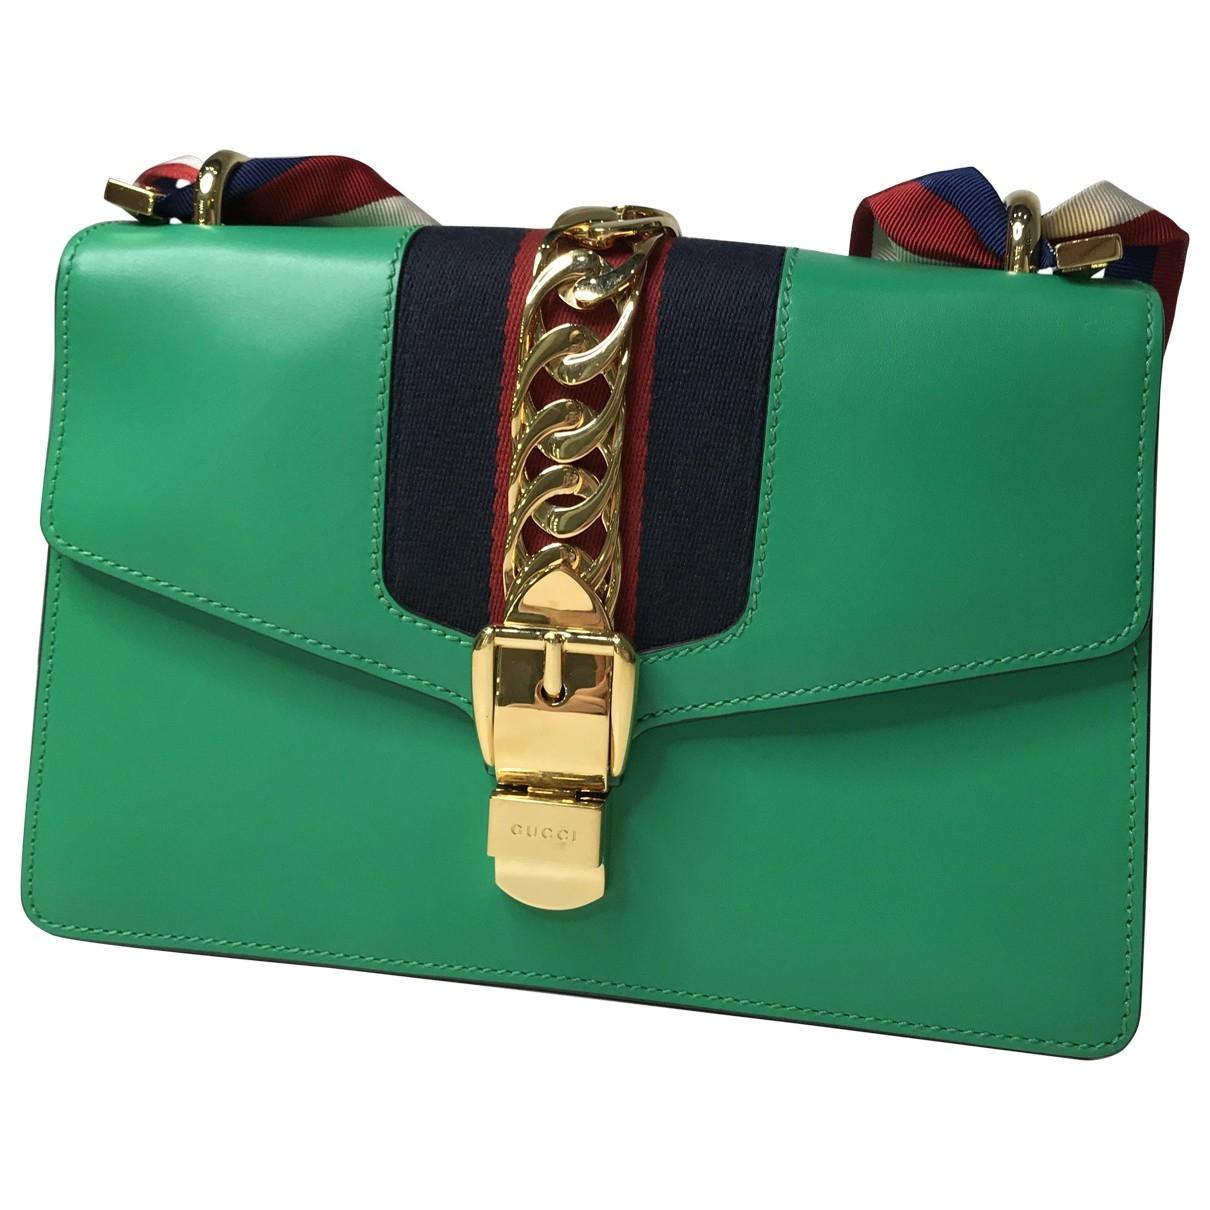 Gucci - Sac a main Sylvie pour femme en cuir - vert